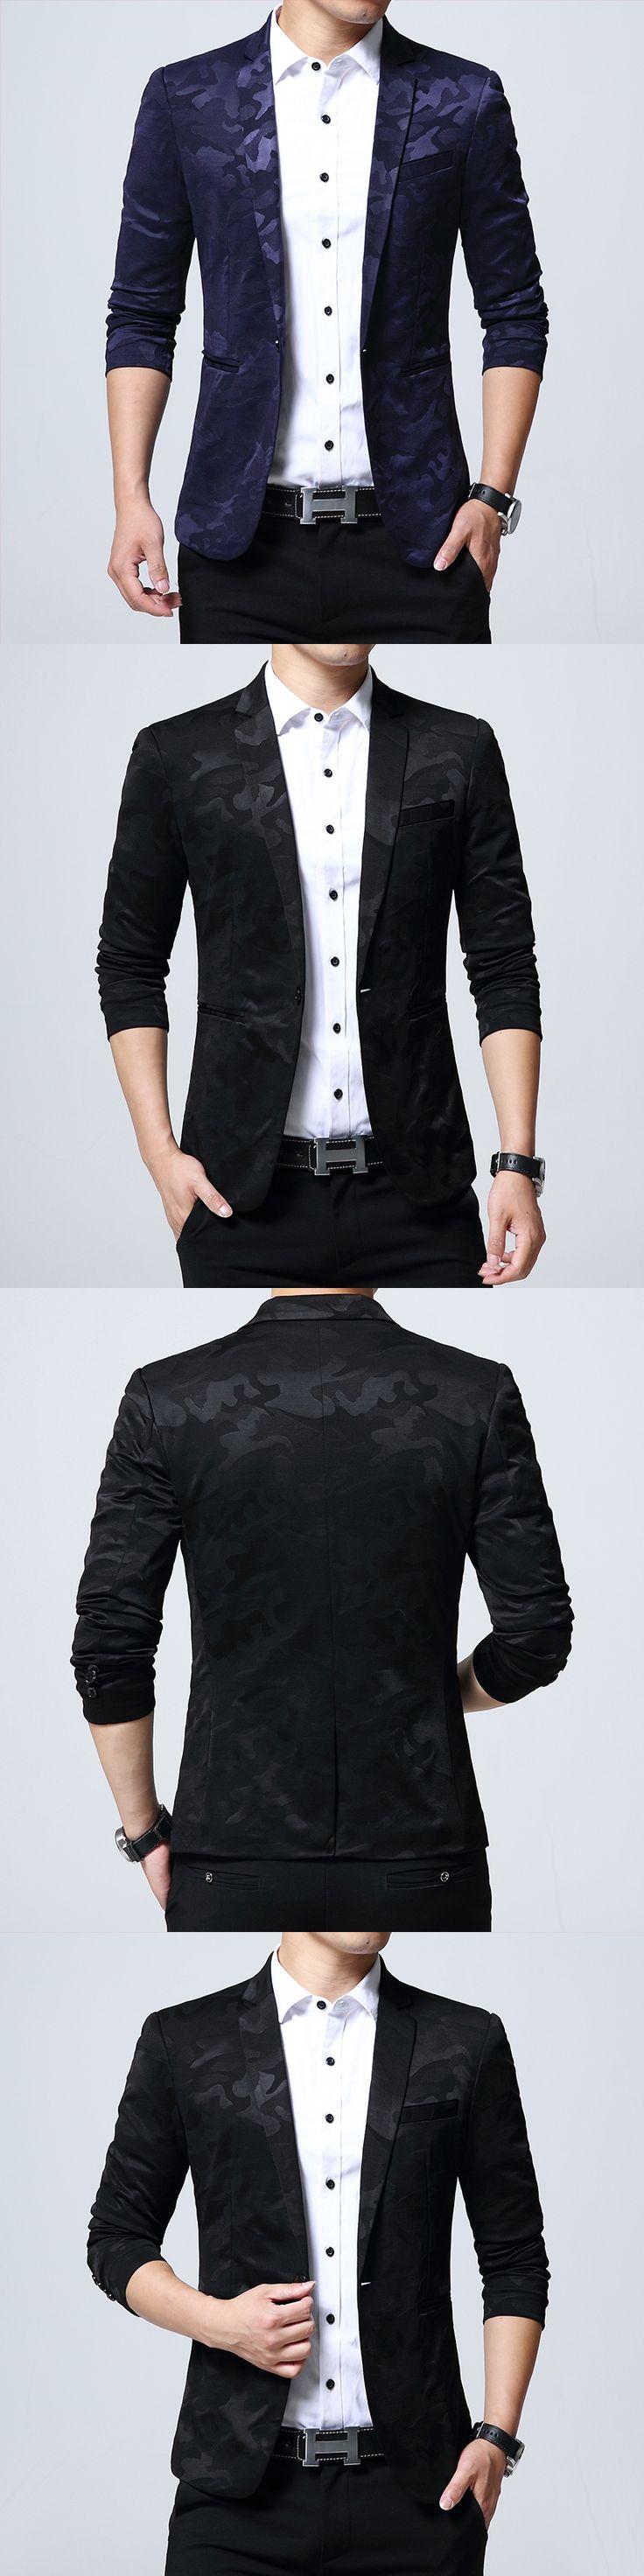 2017 Fashion Men'S Suit Shining Pattern Luxury Casual Men'S Men'S Camouflage Clothing Vintage Wedding Groom Suits 5XL